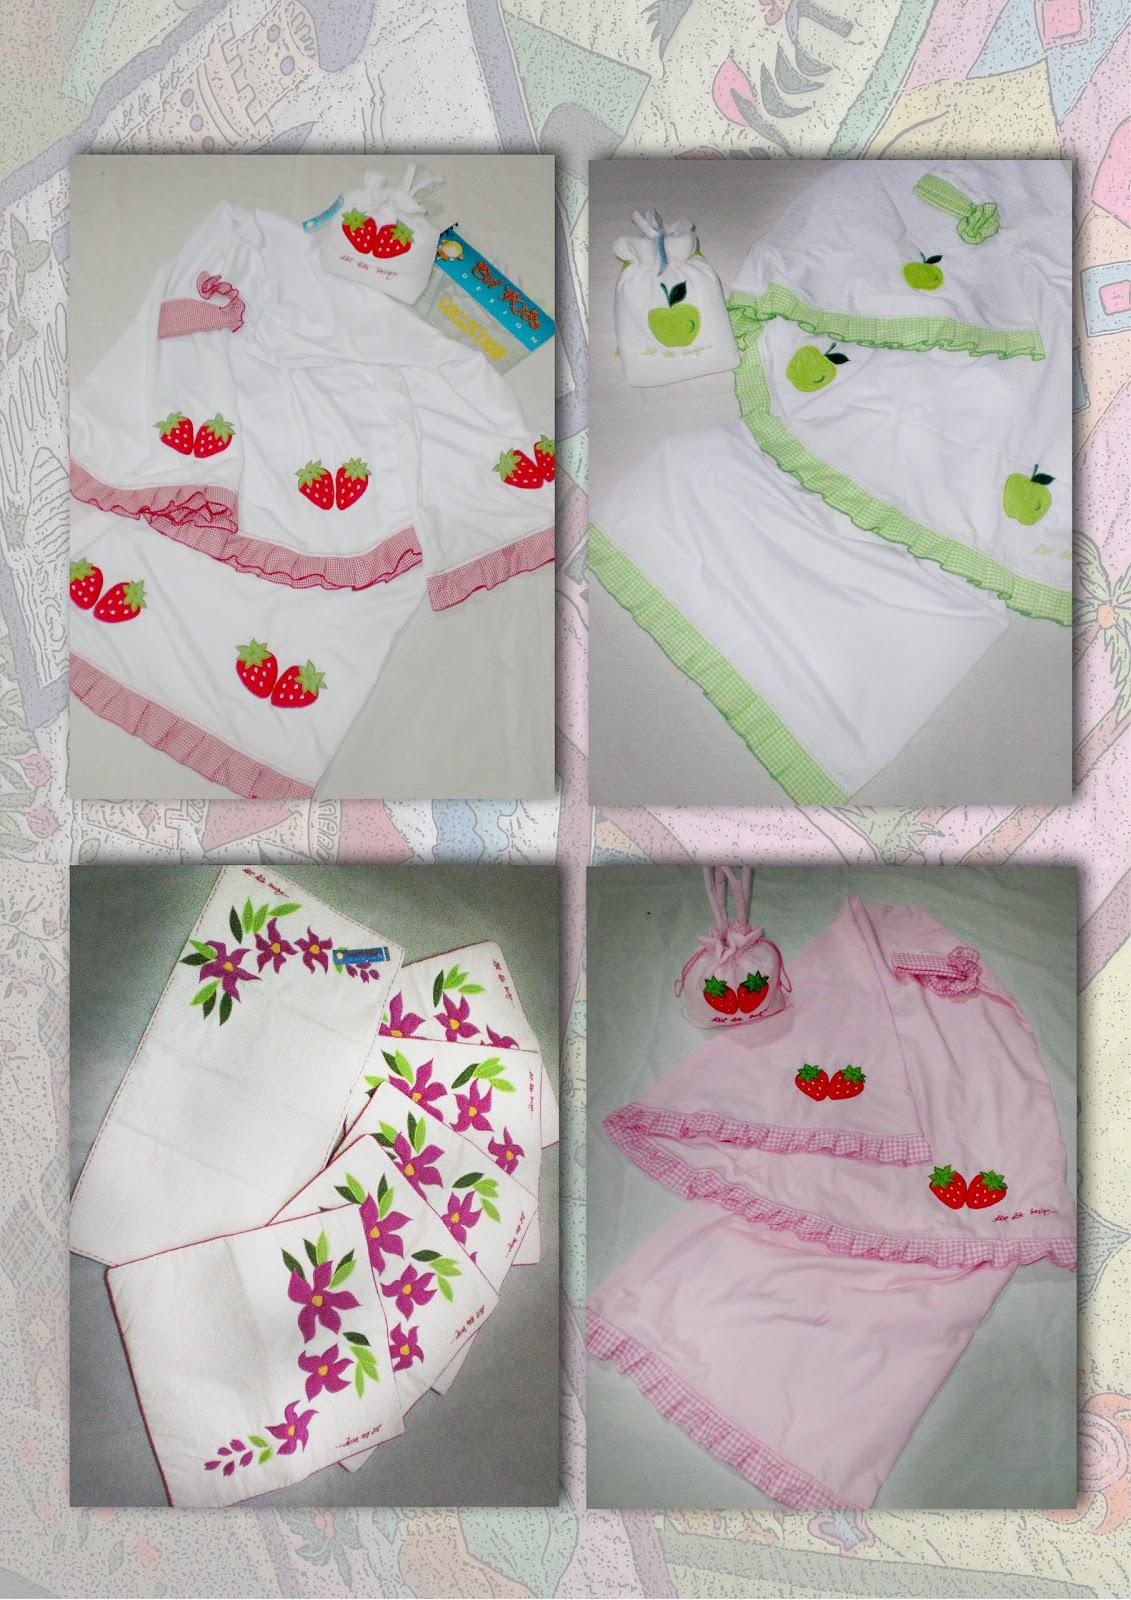 Bikin Toko Fashion Pink Jilbab Anak Kecil RpNot Available